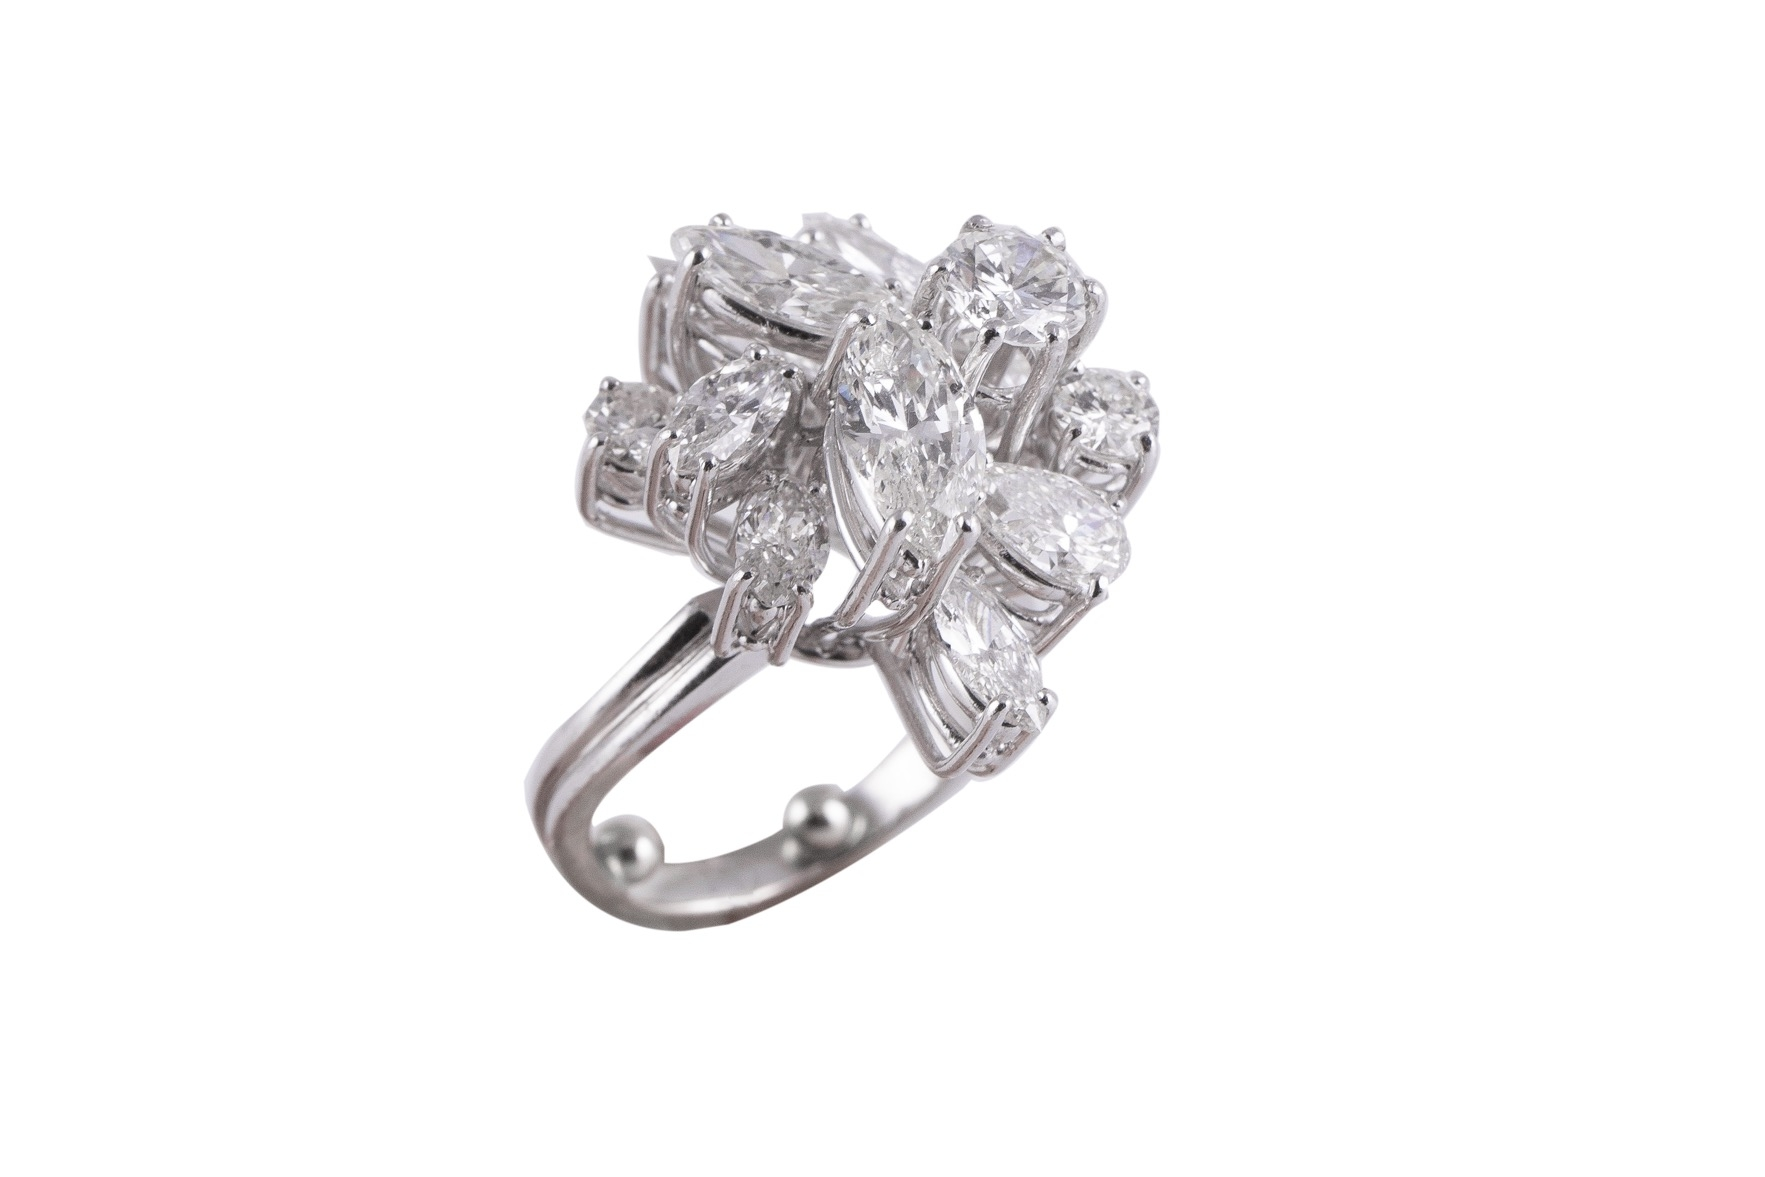 102 - Bague en or blanc sertie de diamants. Adjugé 6720€